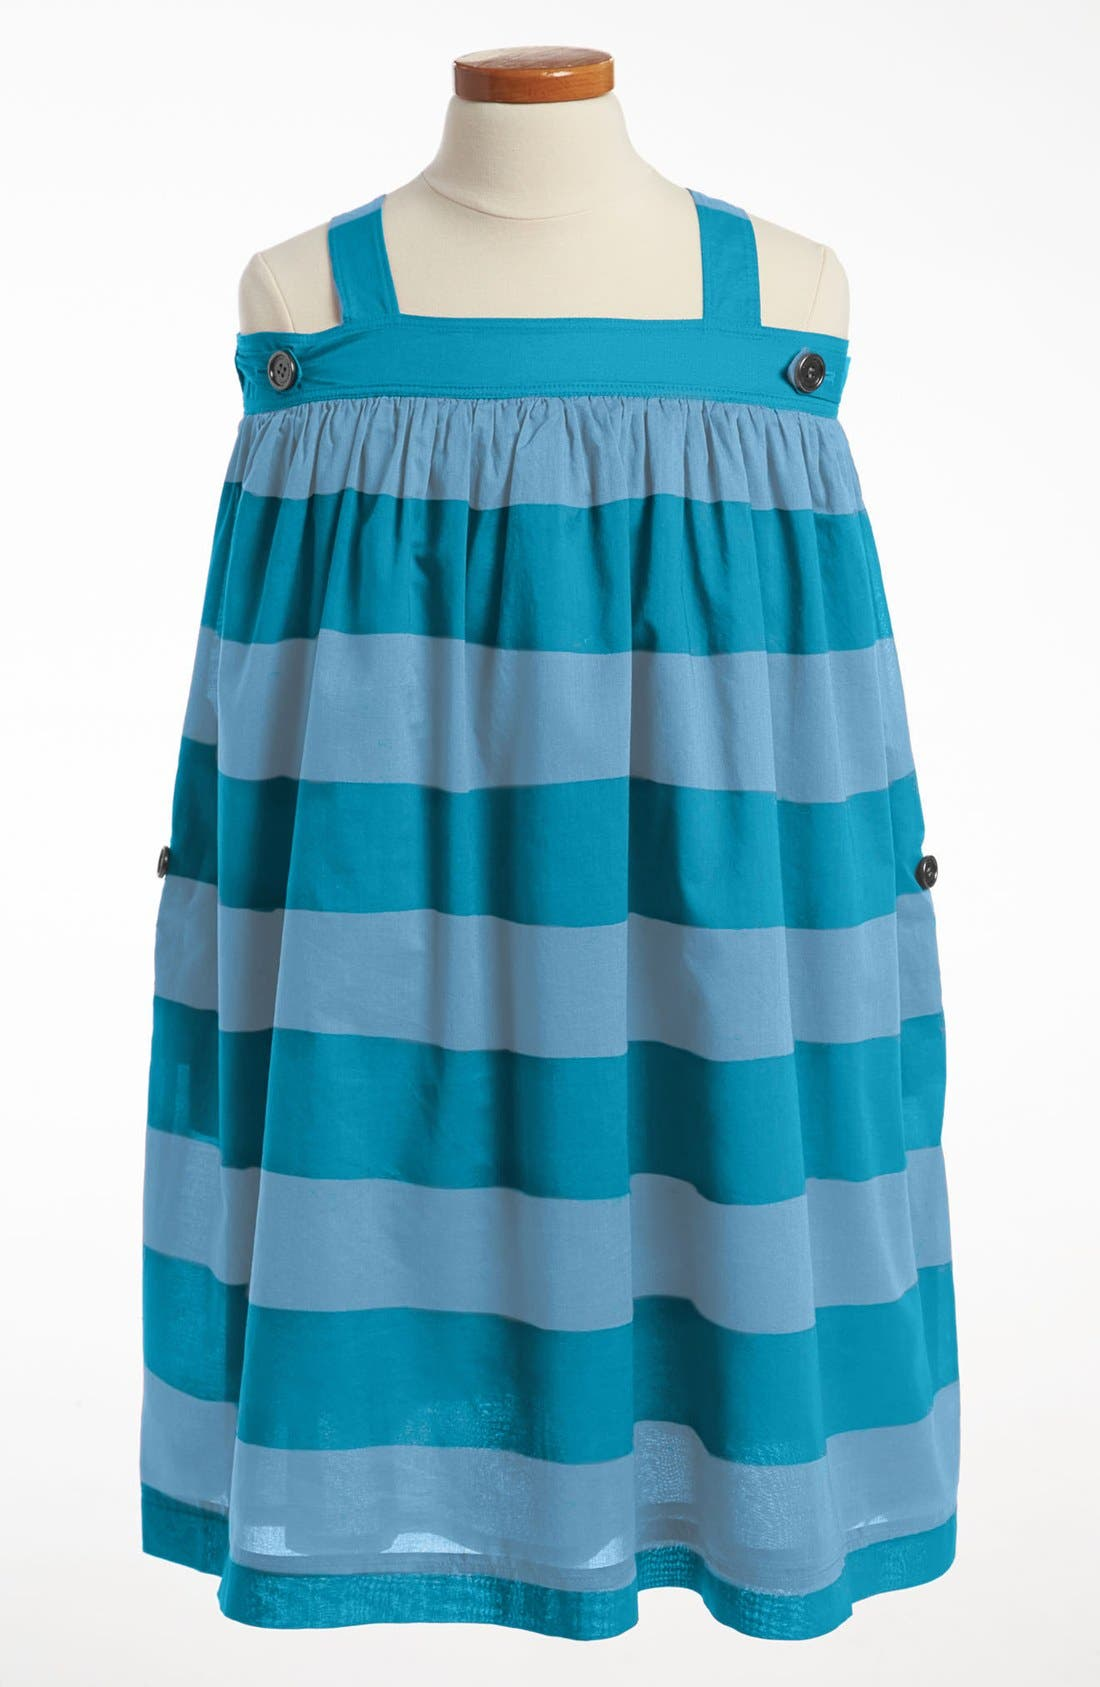 Alternate Image 1 Selected - Burberry 'Dusty' Dress (Little Girls & Big Girls)